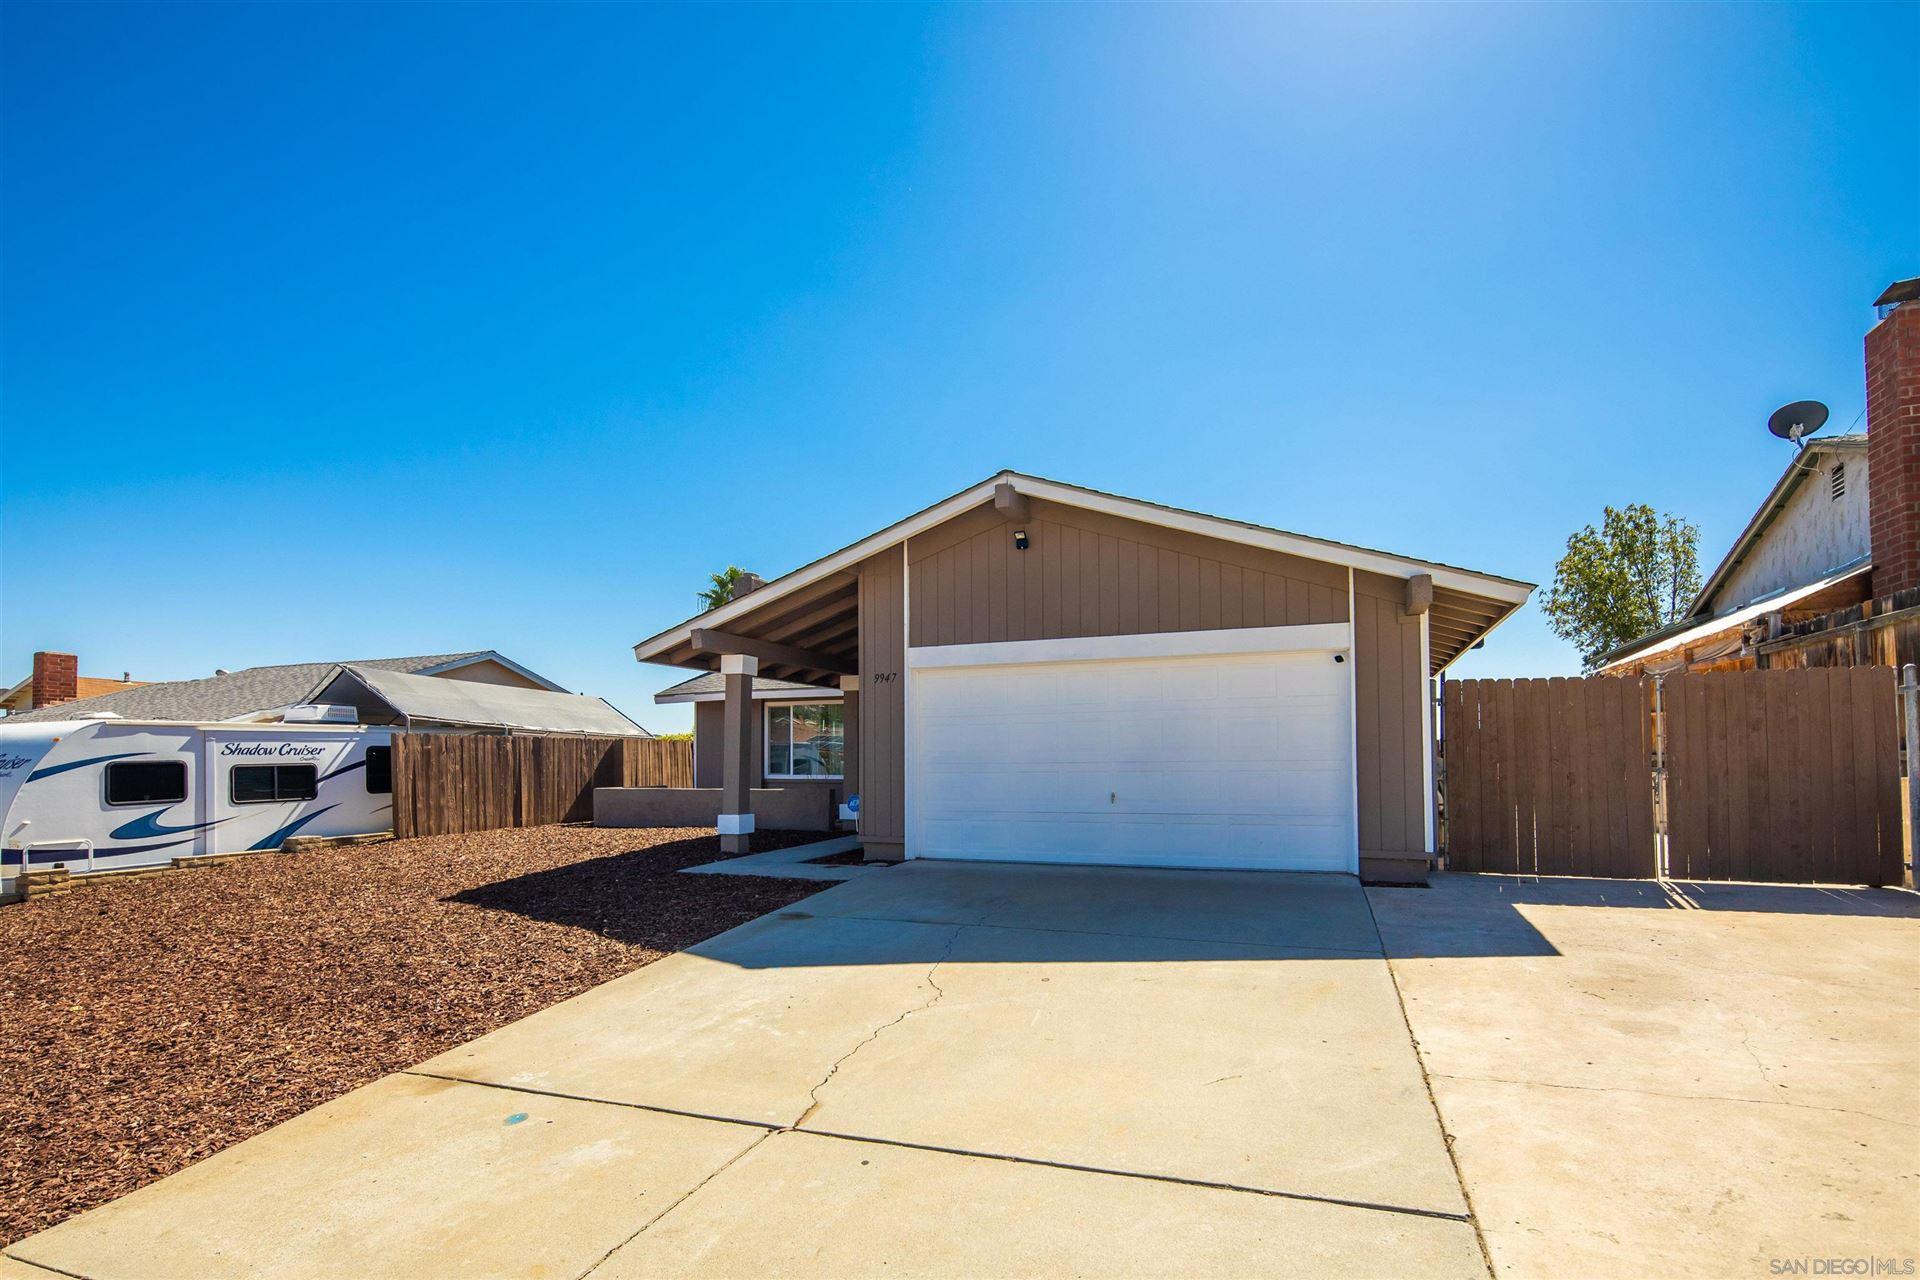 Photo of 9947 Shoredale Dr, Santee, CA 92071 (MLS # 210028863)